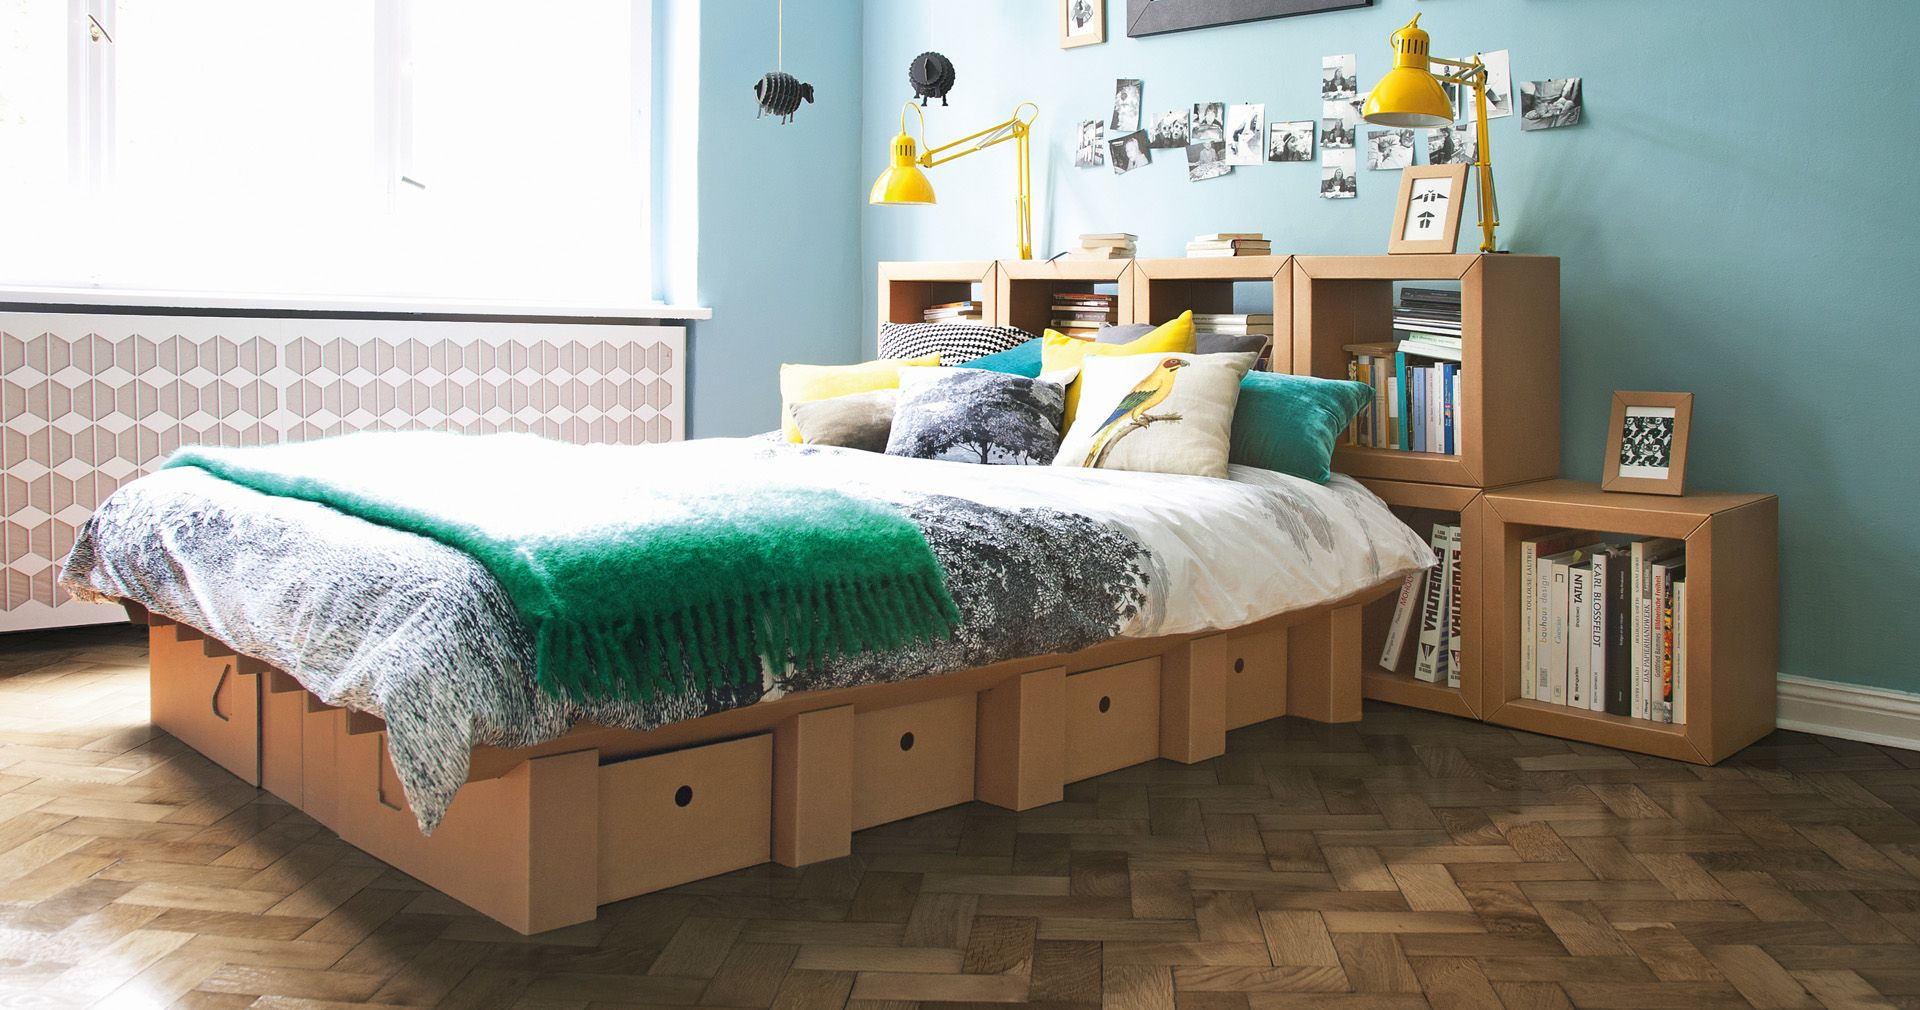 home page pappm bel shop f r m bel aus pappe von stange design pappm bel pinterest. Black Bedroom Furniture Sets. Home Design Ideas